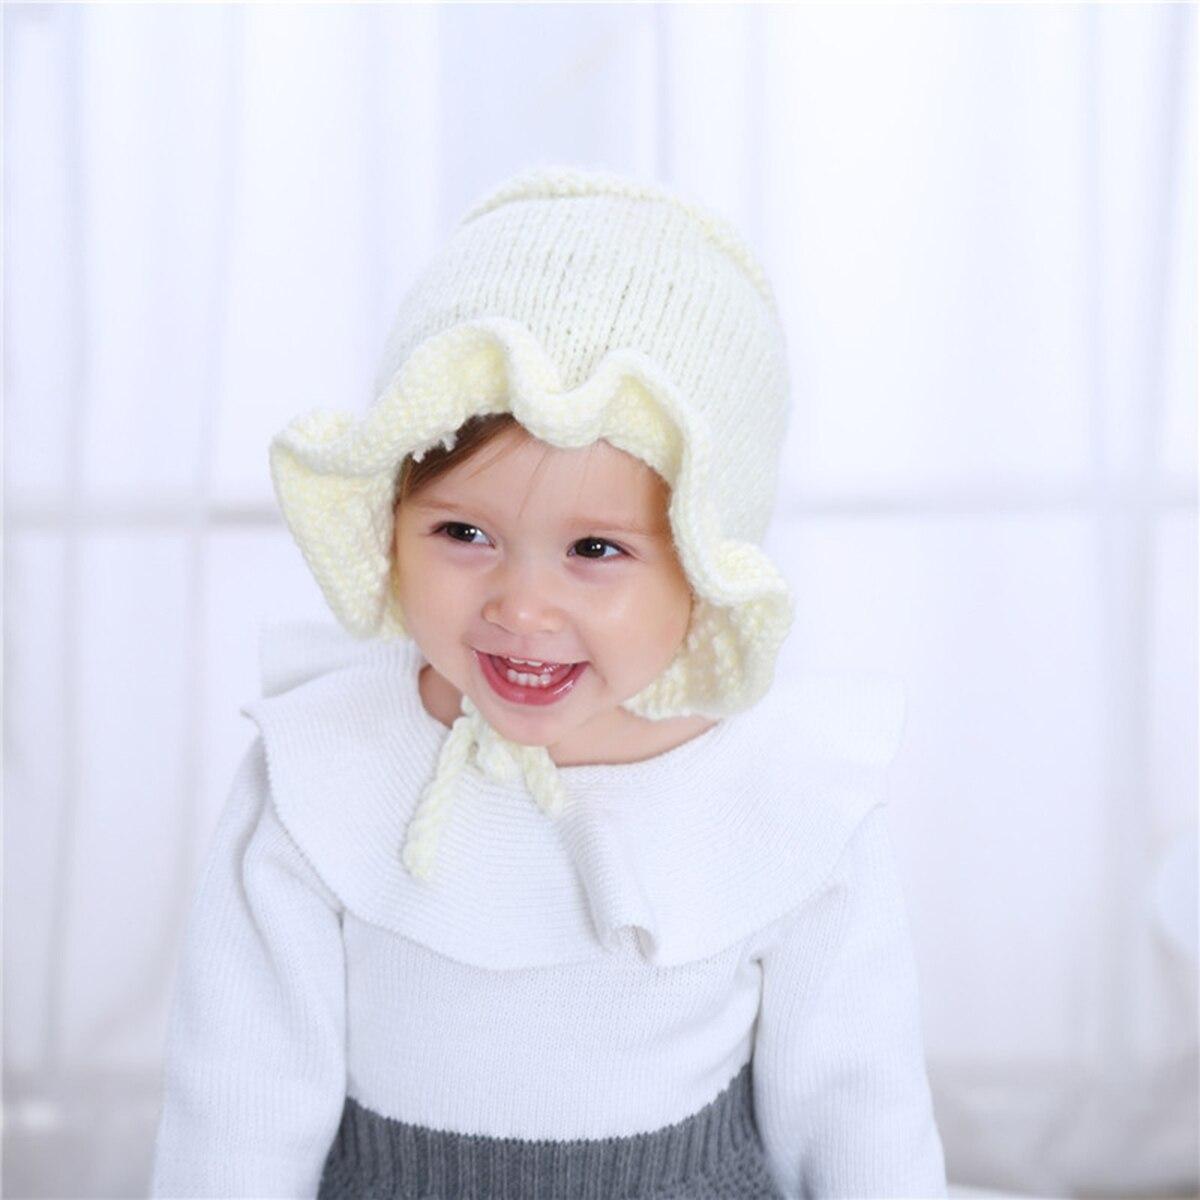 ... Fashion Winter Warm Women Knitted Beanie Cute Popular Hat Newborn Infant  Kid Baby Boy Baby Girl ... d8d2d0e5e